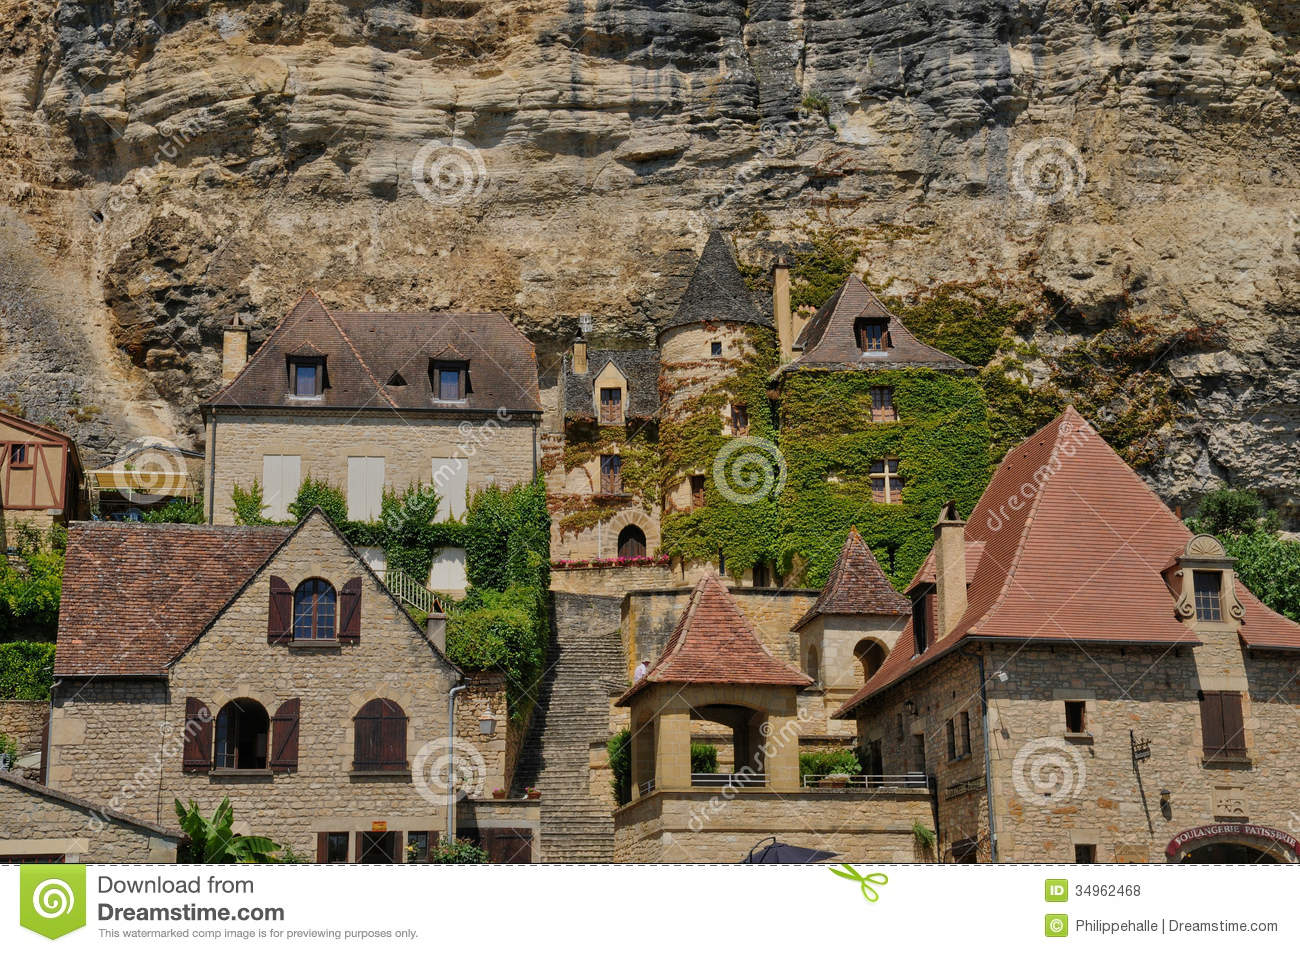 France, Picturesque Village Of La Roque Gageac In Dordogne Royalty.